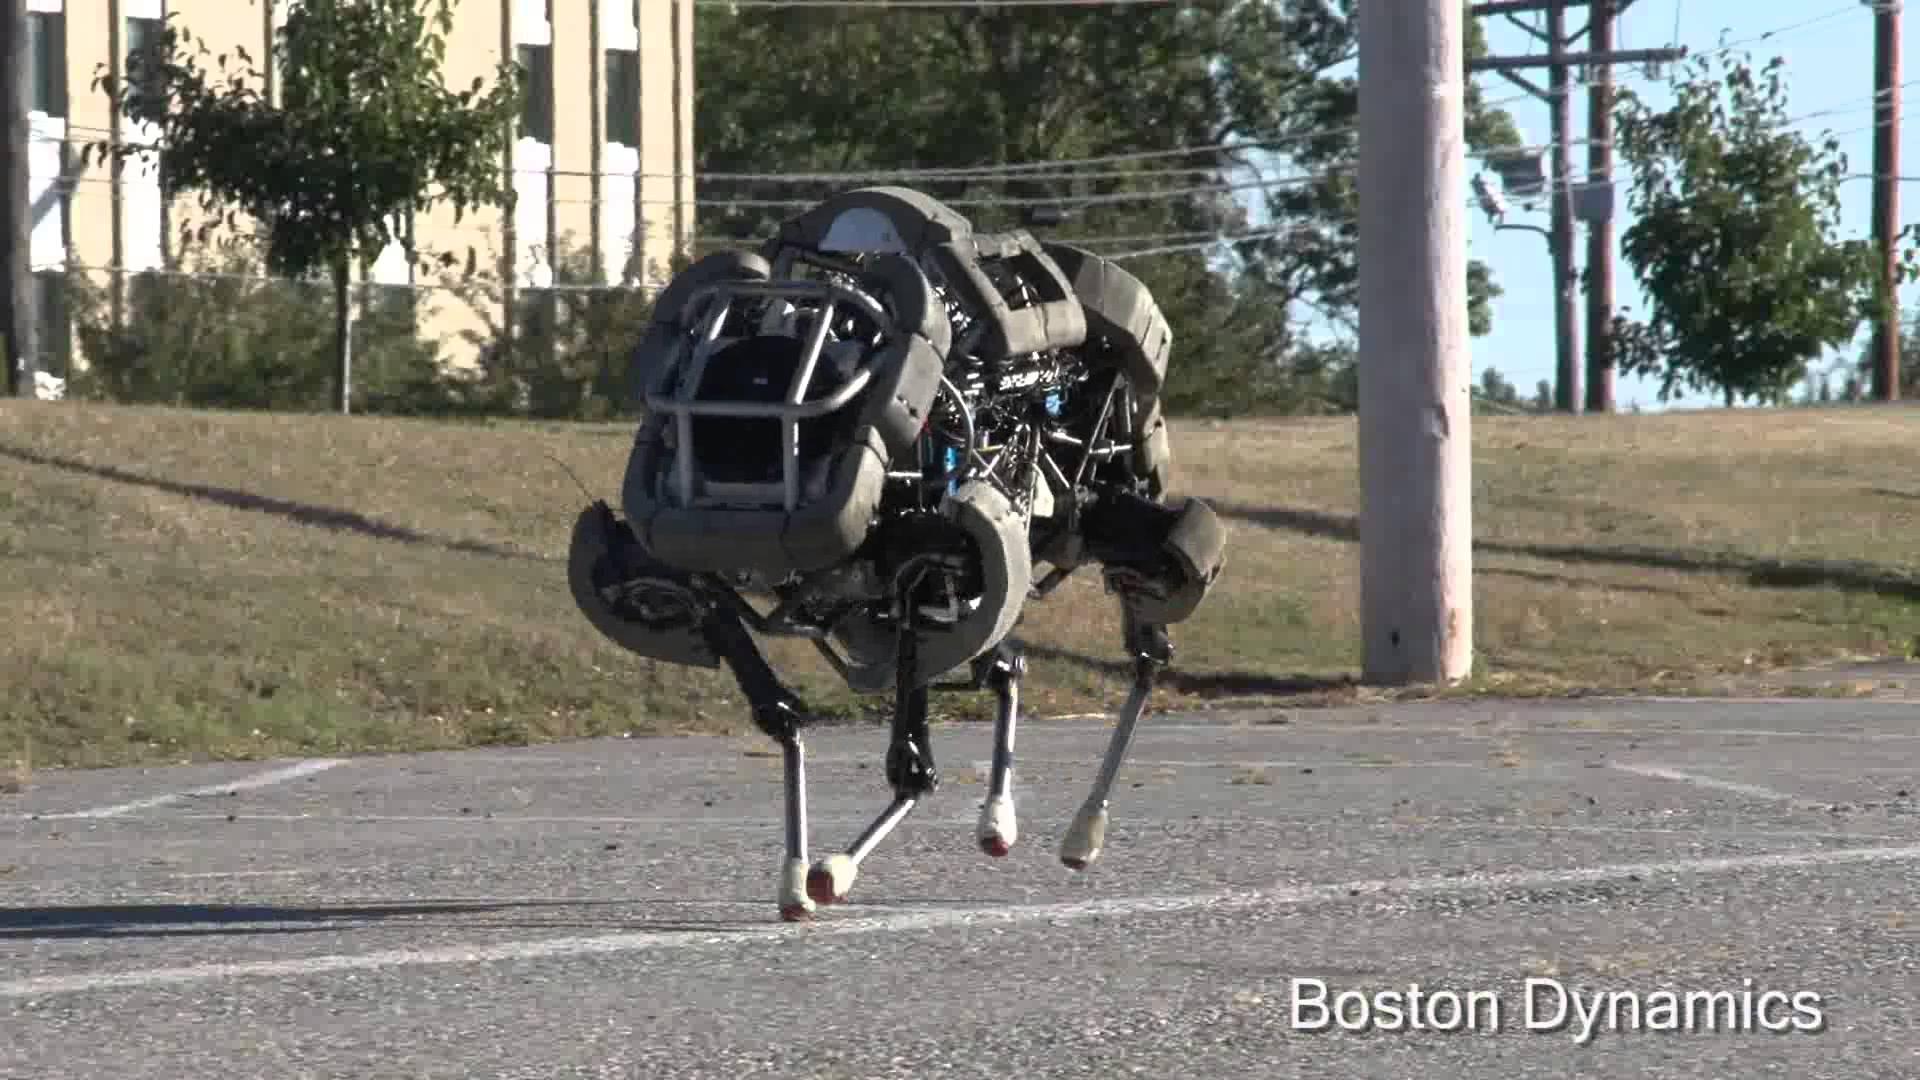 boston dynamics wildcat robot.jpg